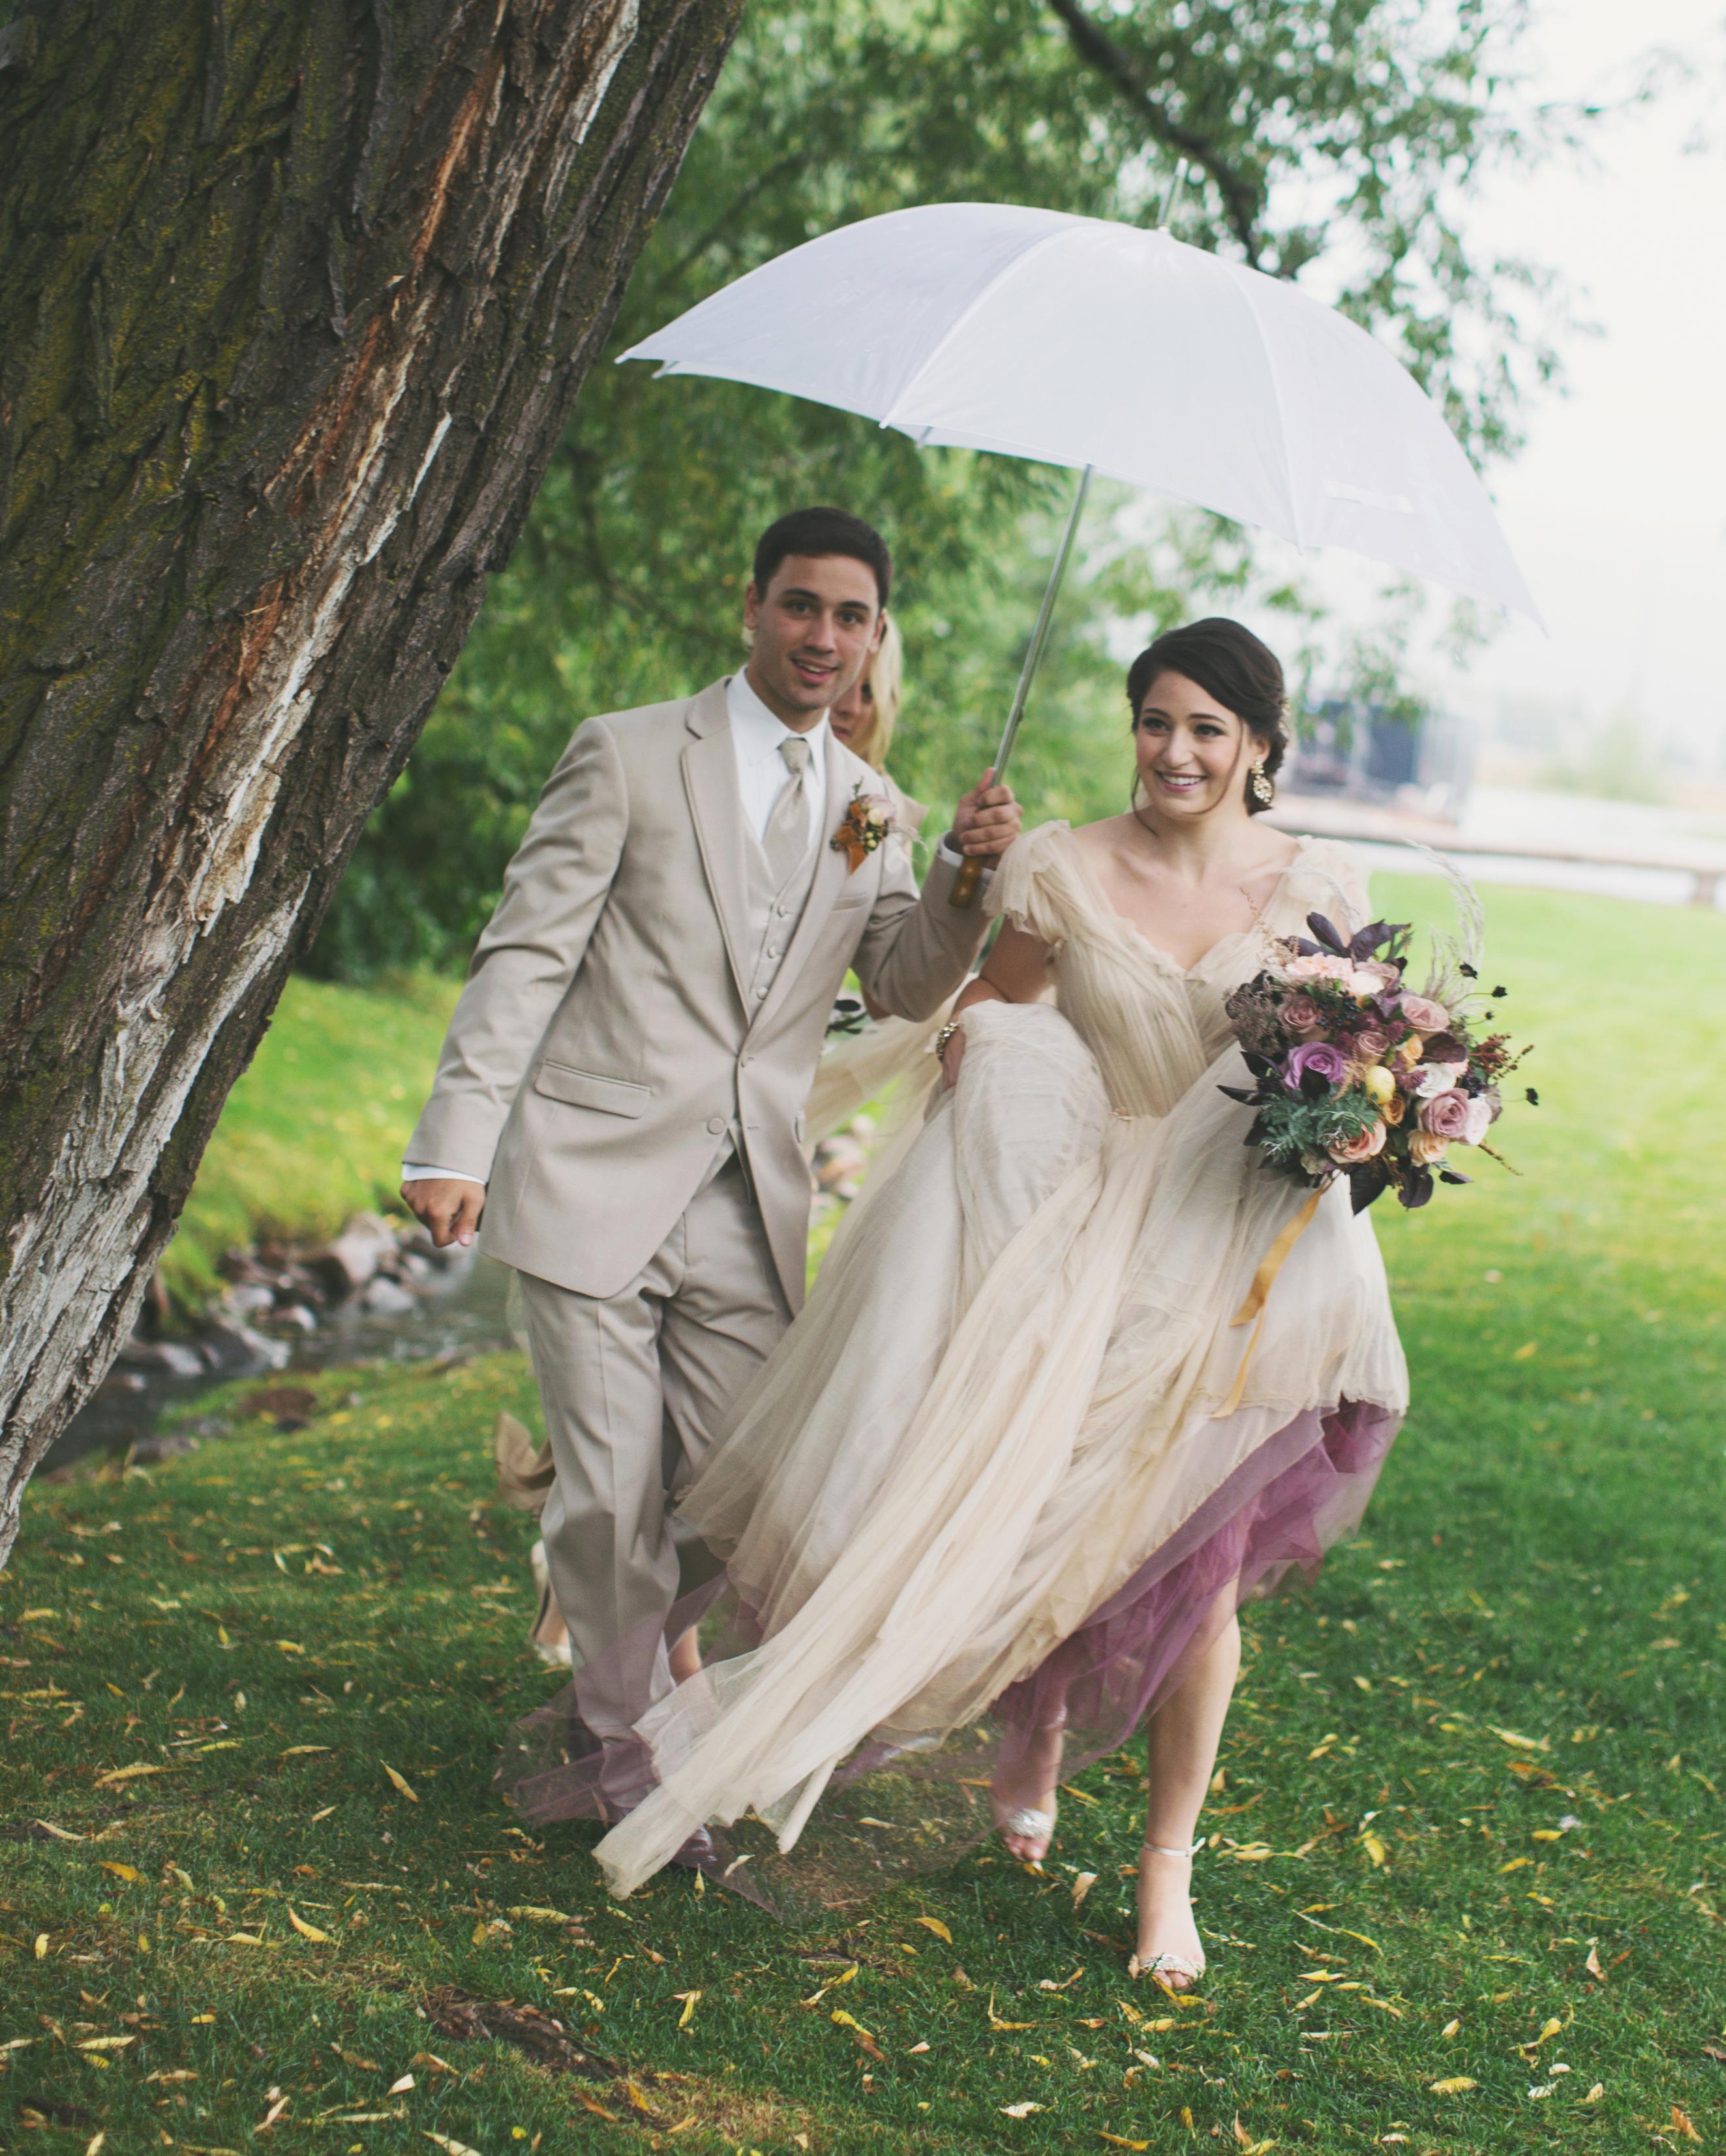 sara-matt-wedding-rain-2249-s111990-0715.jpg